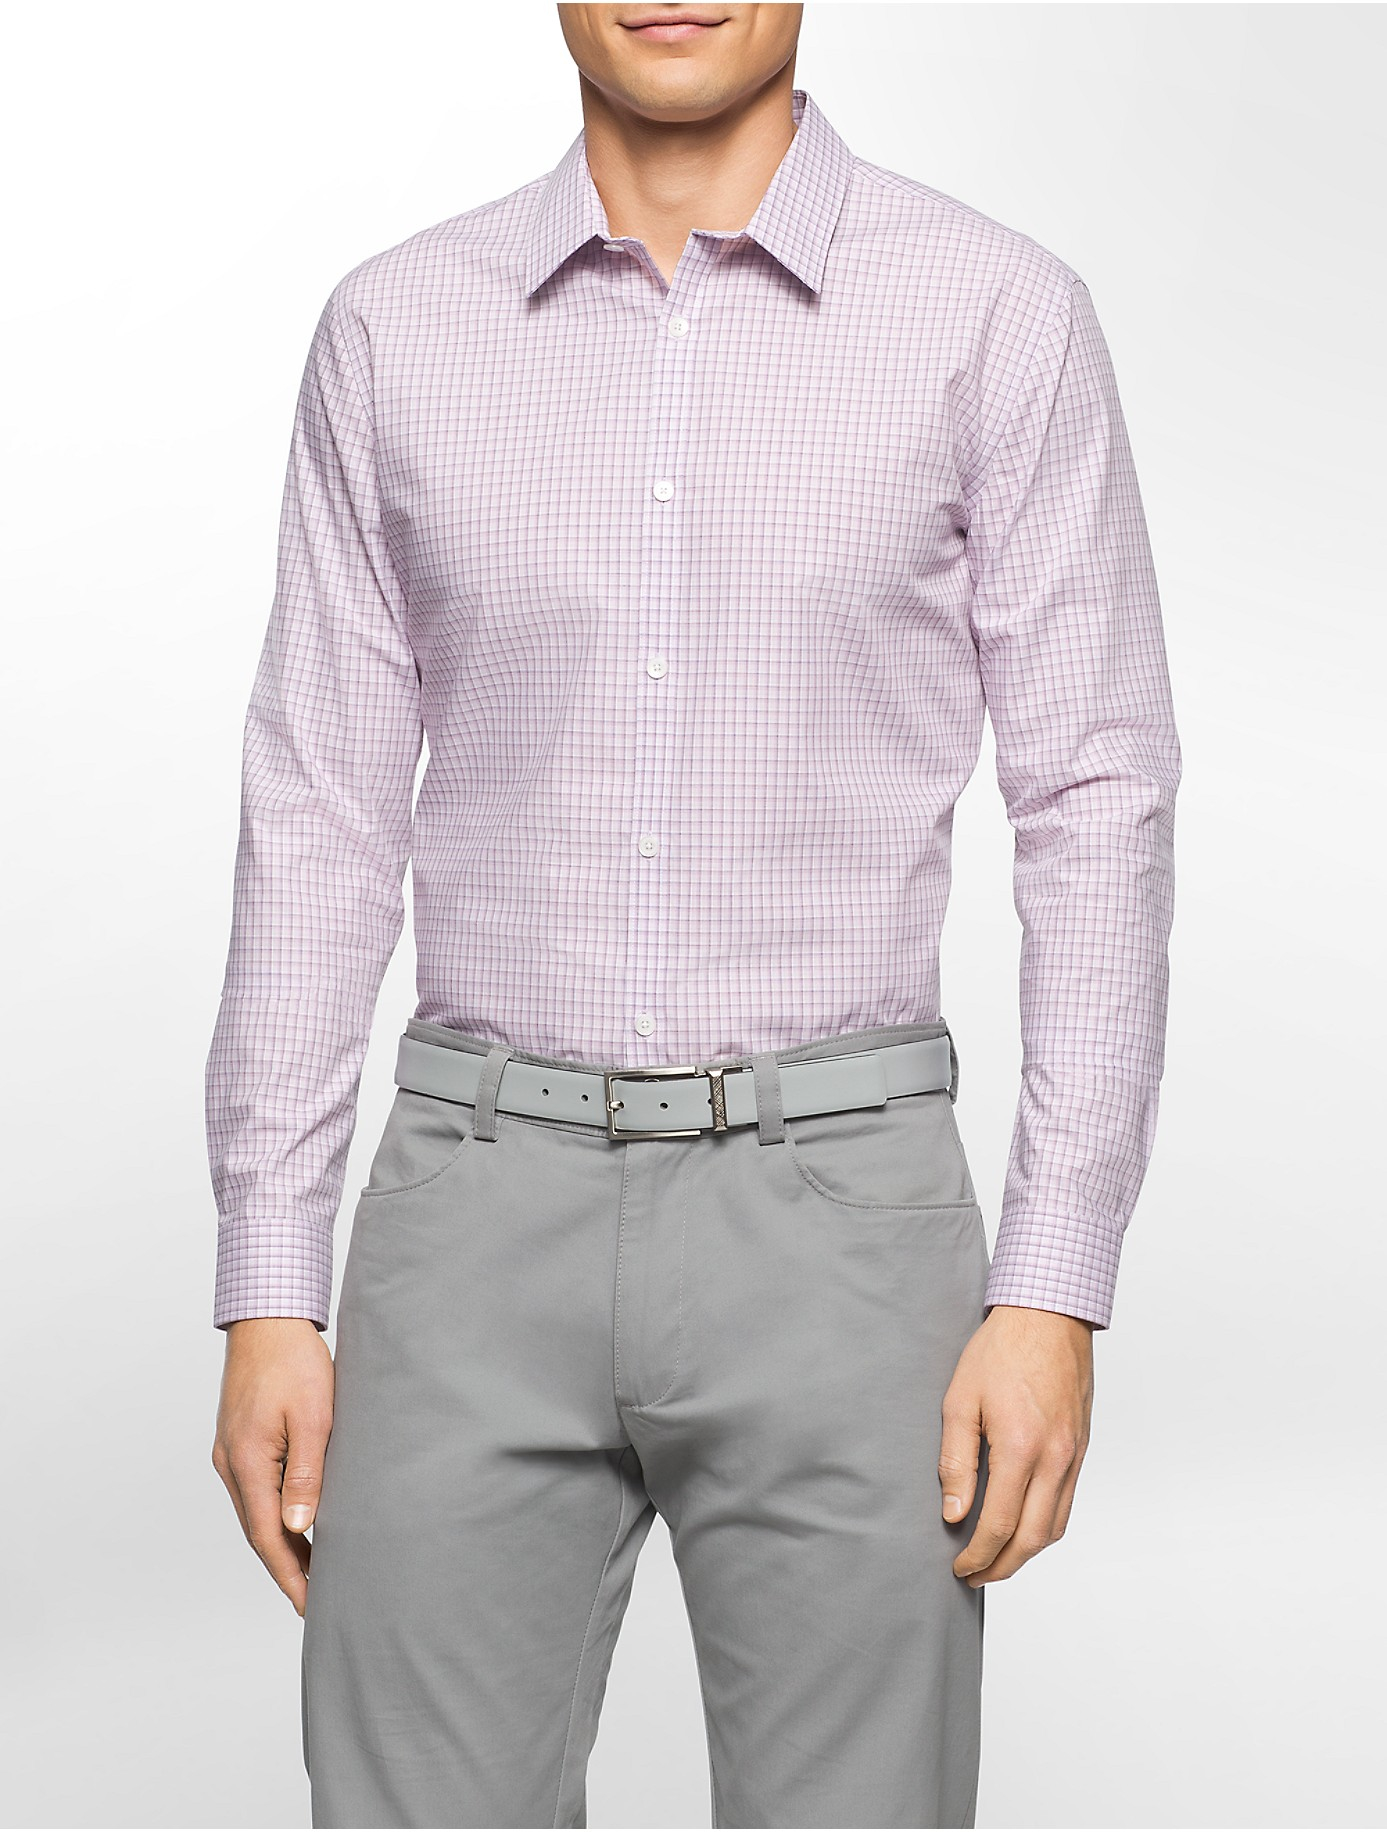 Calvin Klein Mens Fitted Dress Shirts Rldm